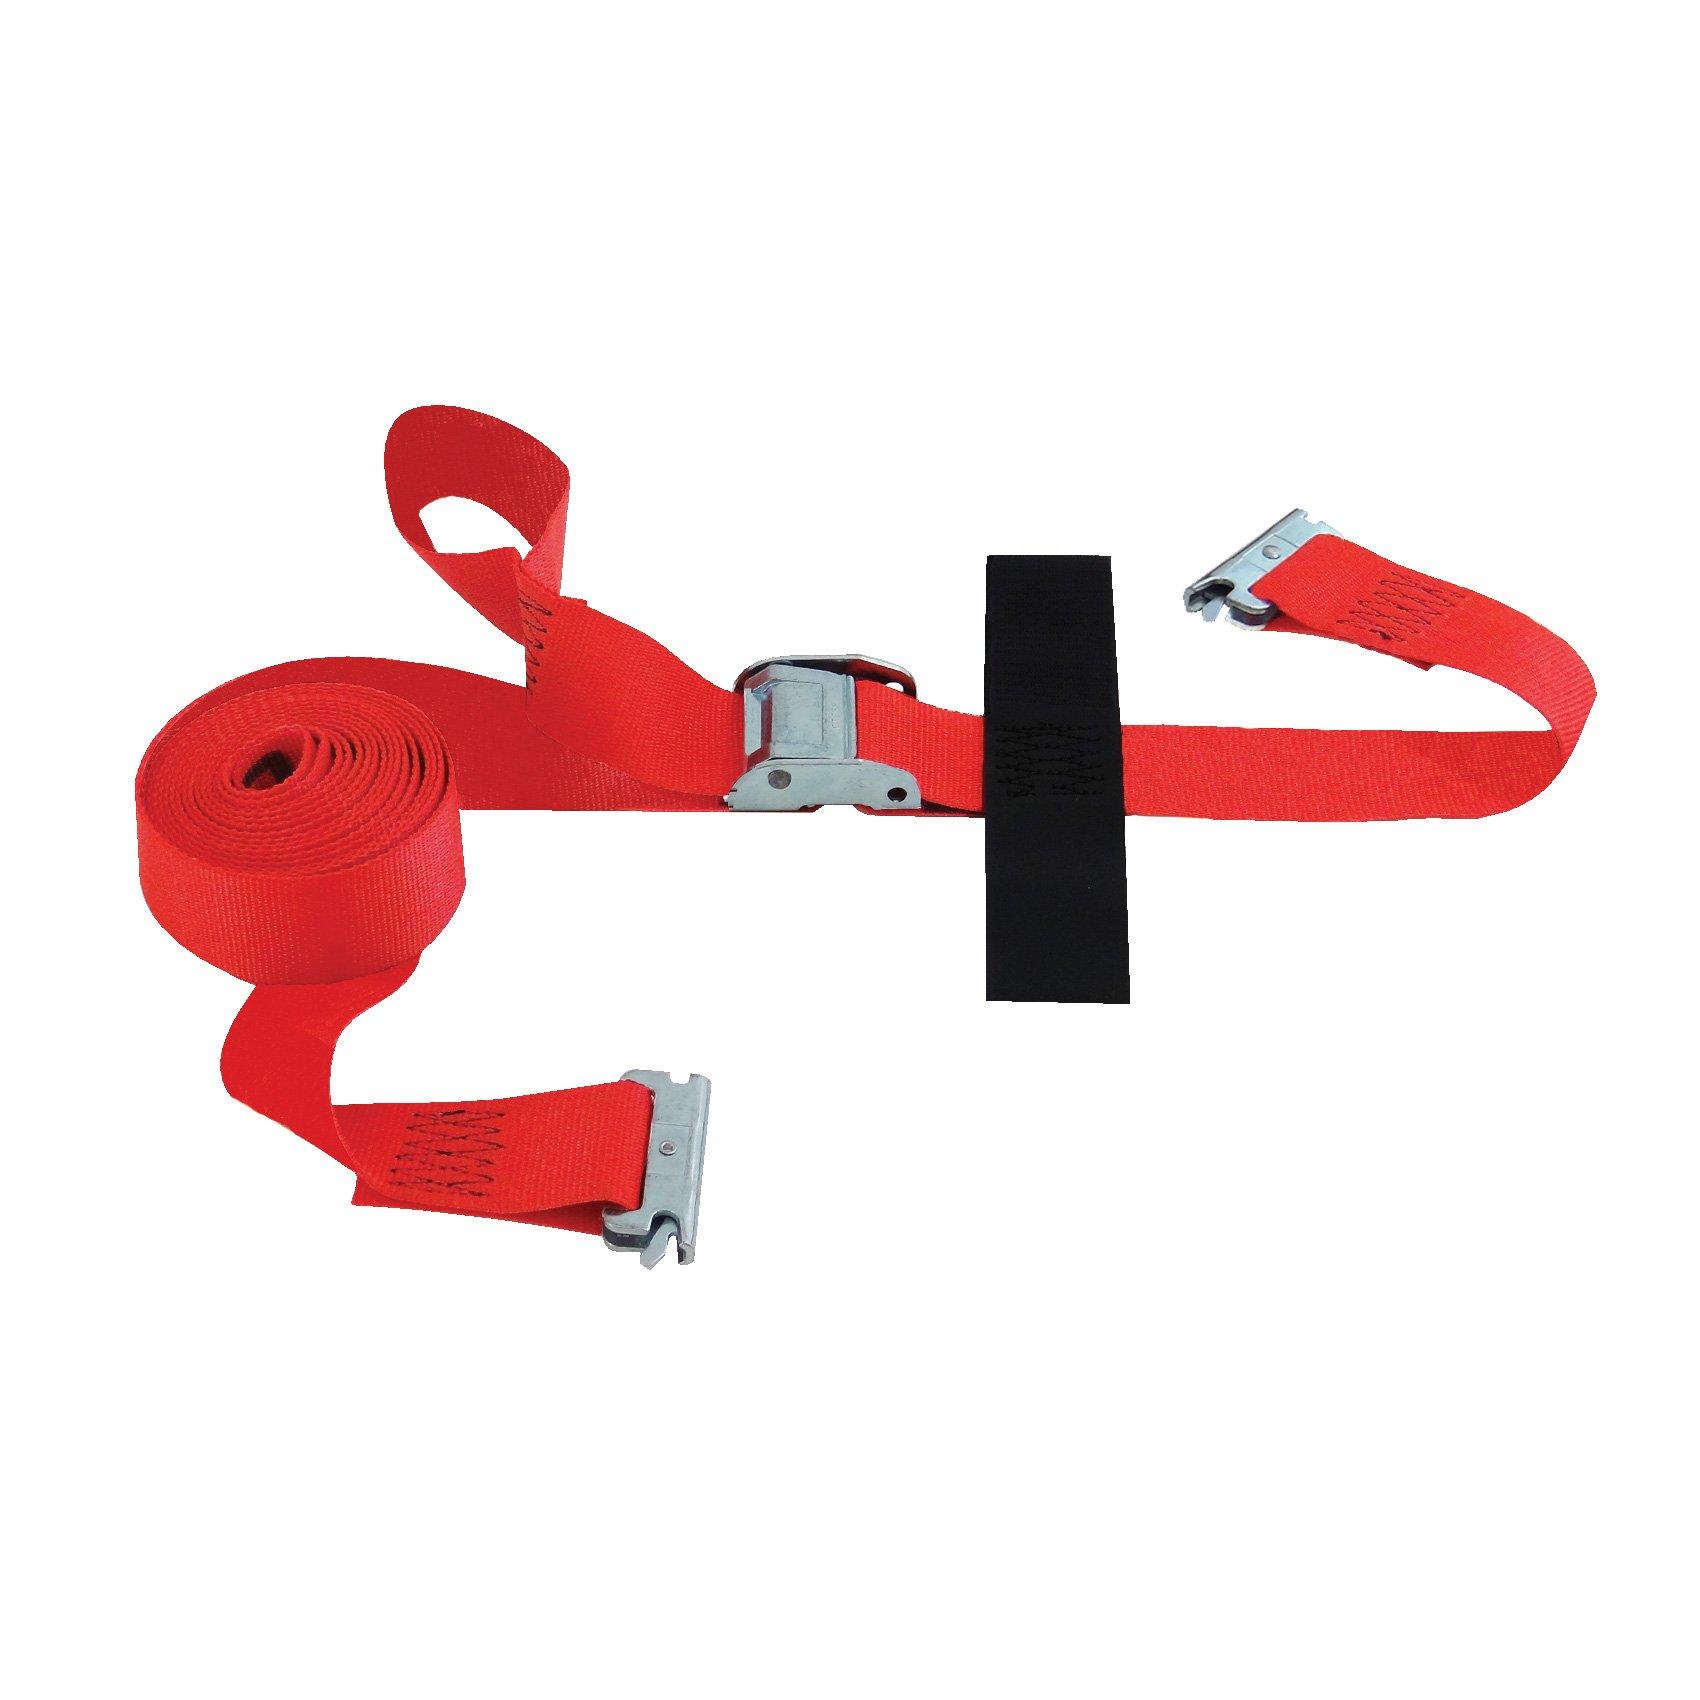 SNAPLOCS E-STRAP 2''x16' CAM (Import) with Hook & Loop storage fastener